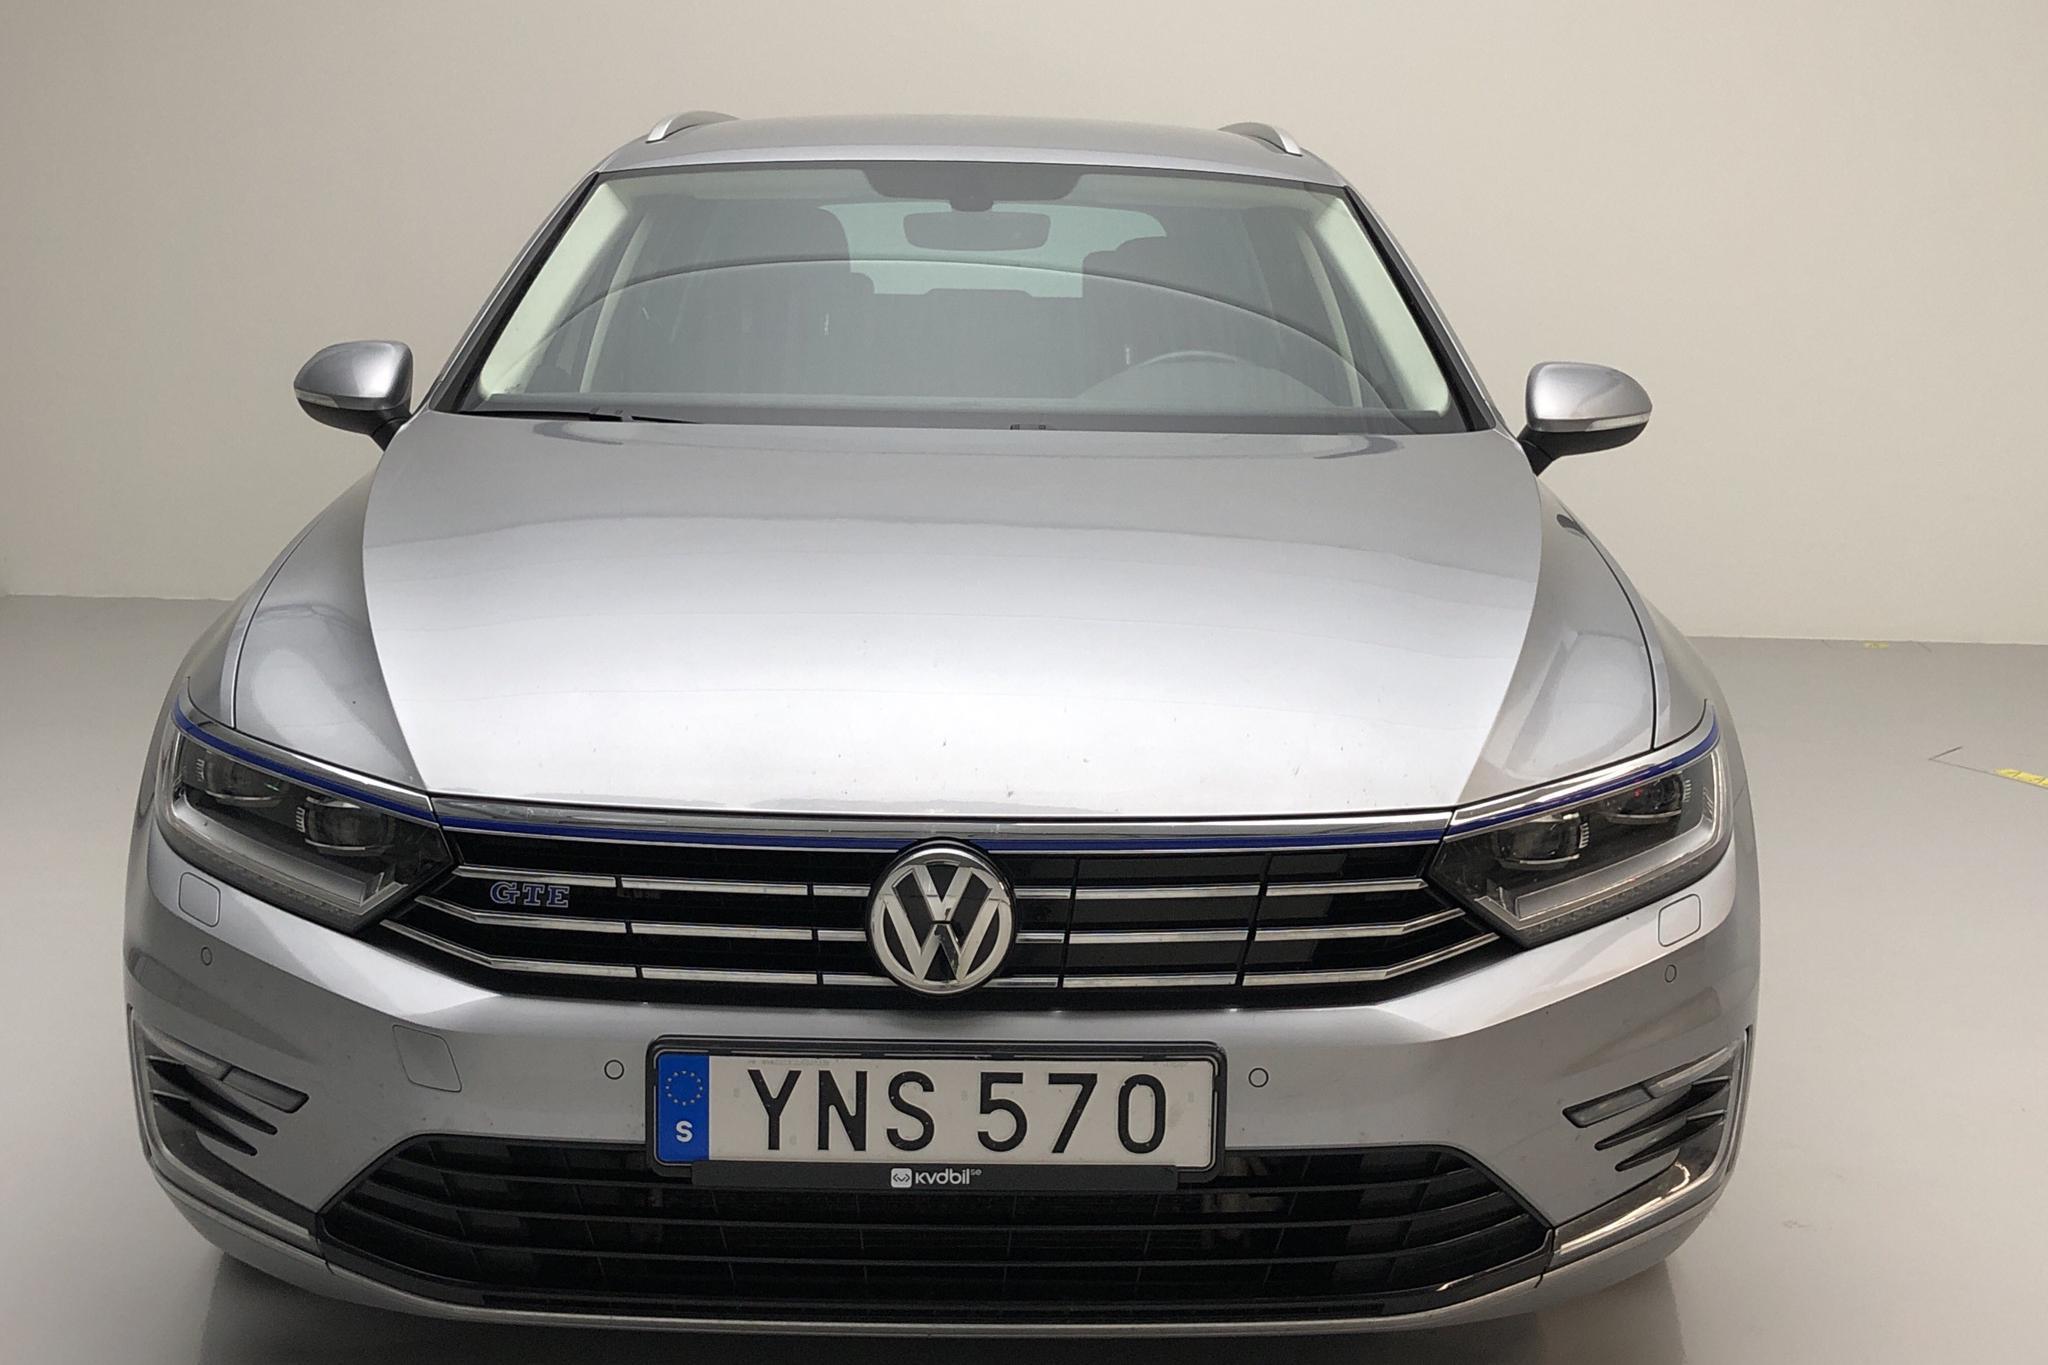 VW Passat 1.4 Plug-in-Hybrid Sportscombi (218hk) - 7 205 mil - Automat - silver - 2018